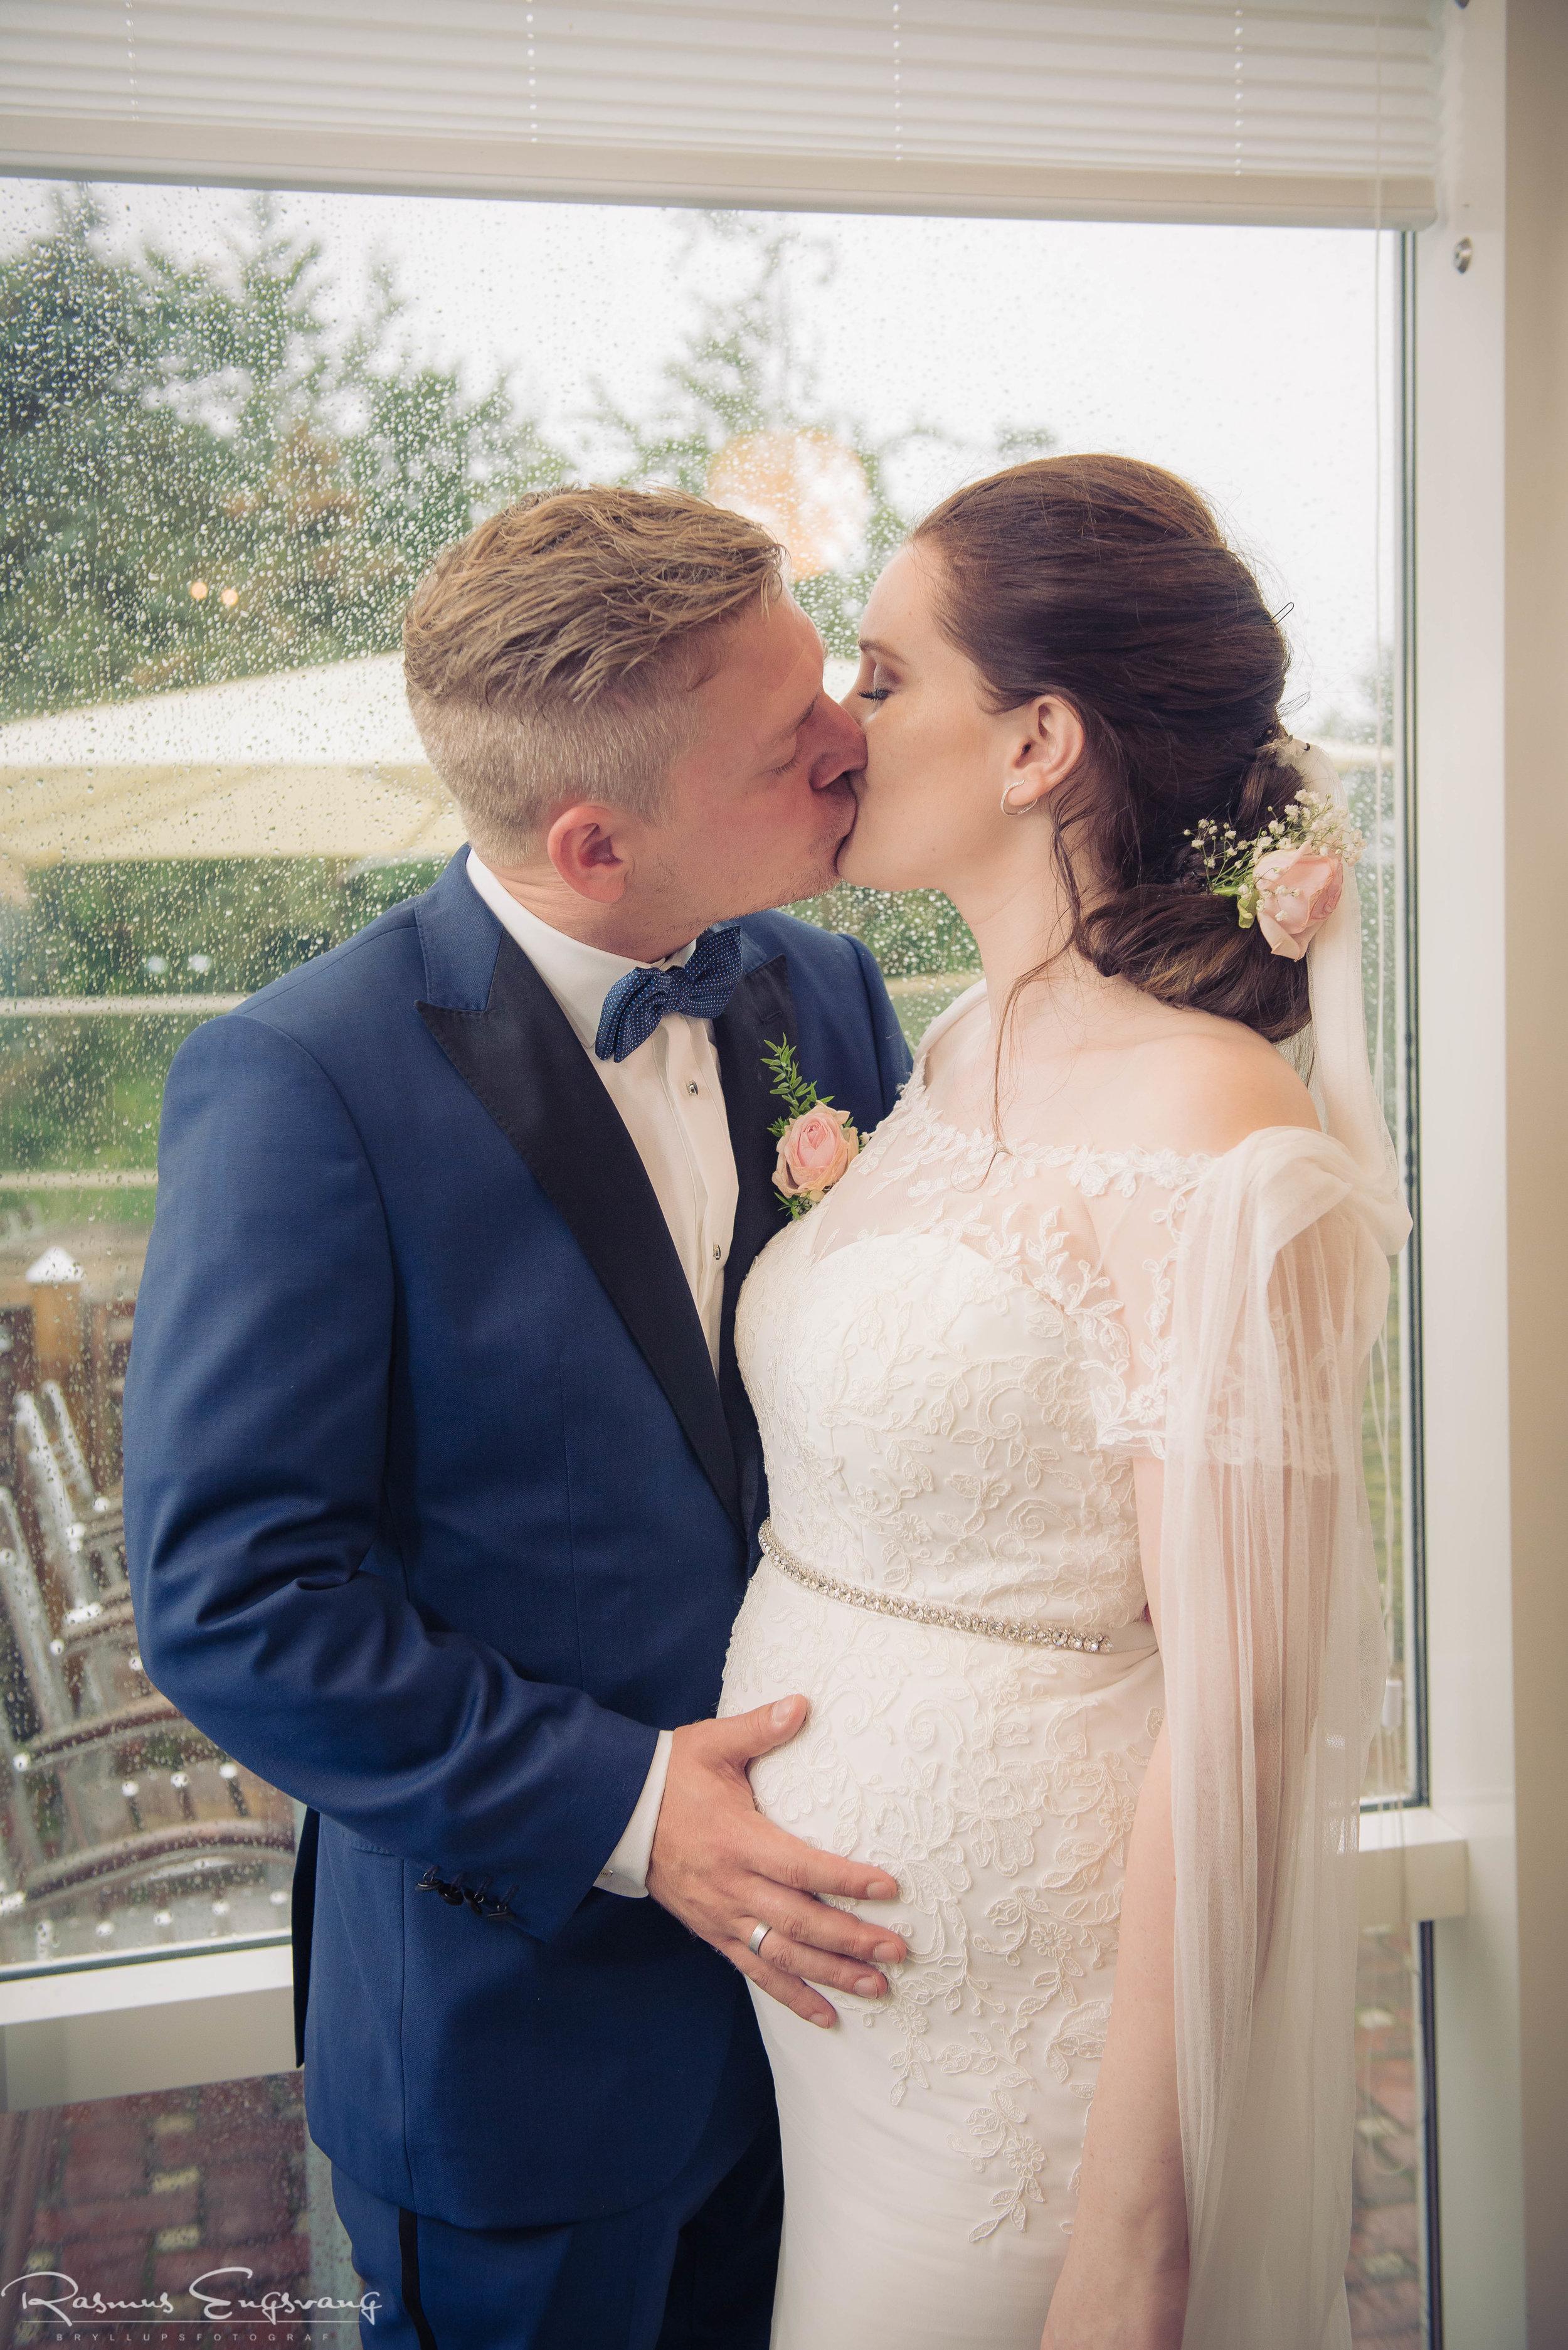 Bryllupsfotograf_Ringsted_Sjælland_Sørup_Herregaard-205.jpg